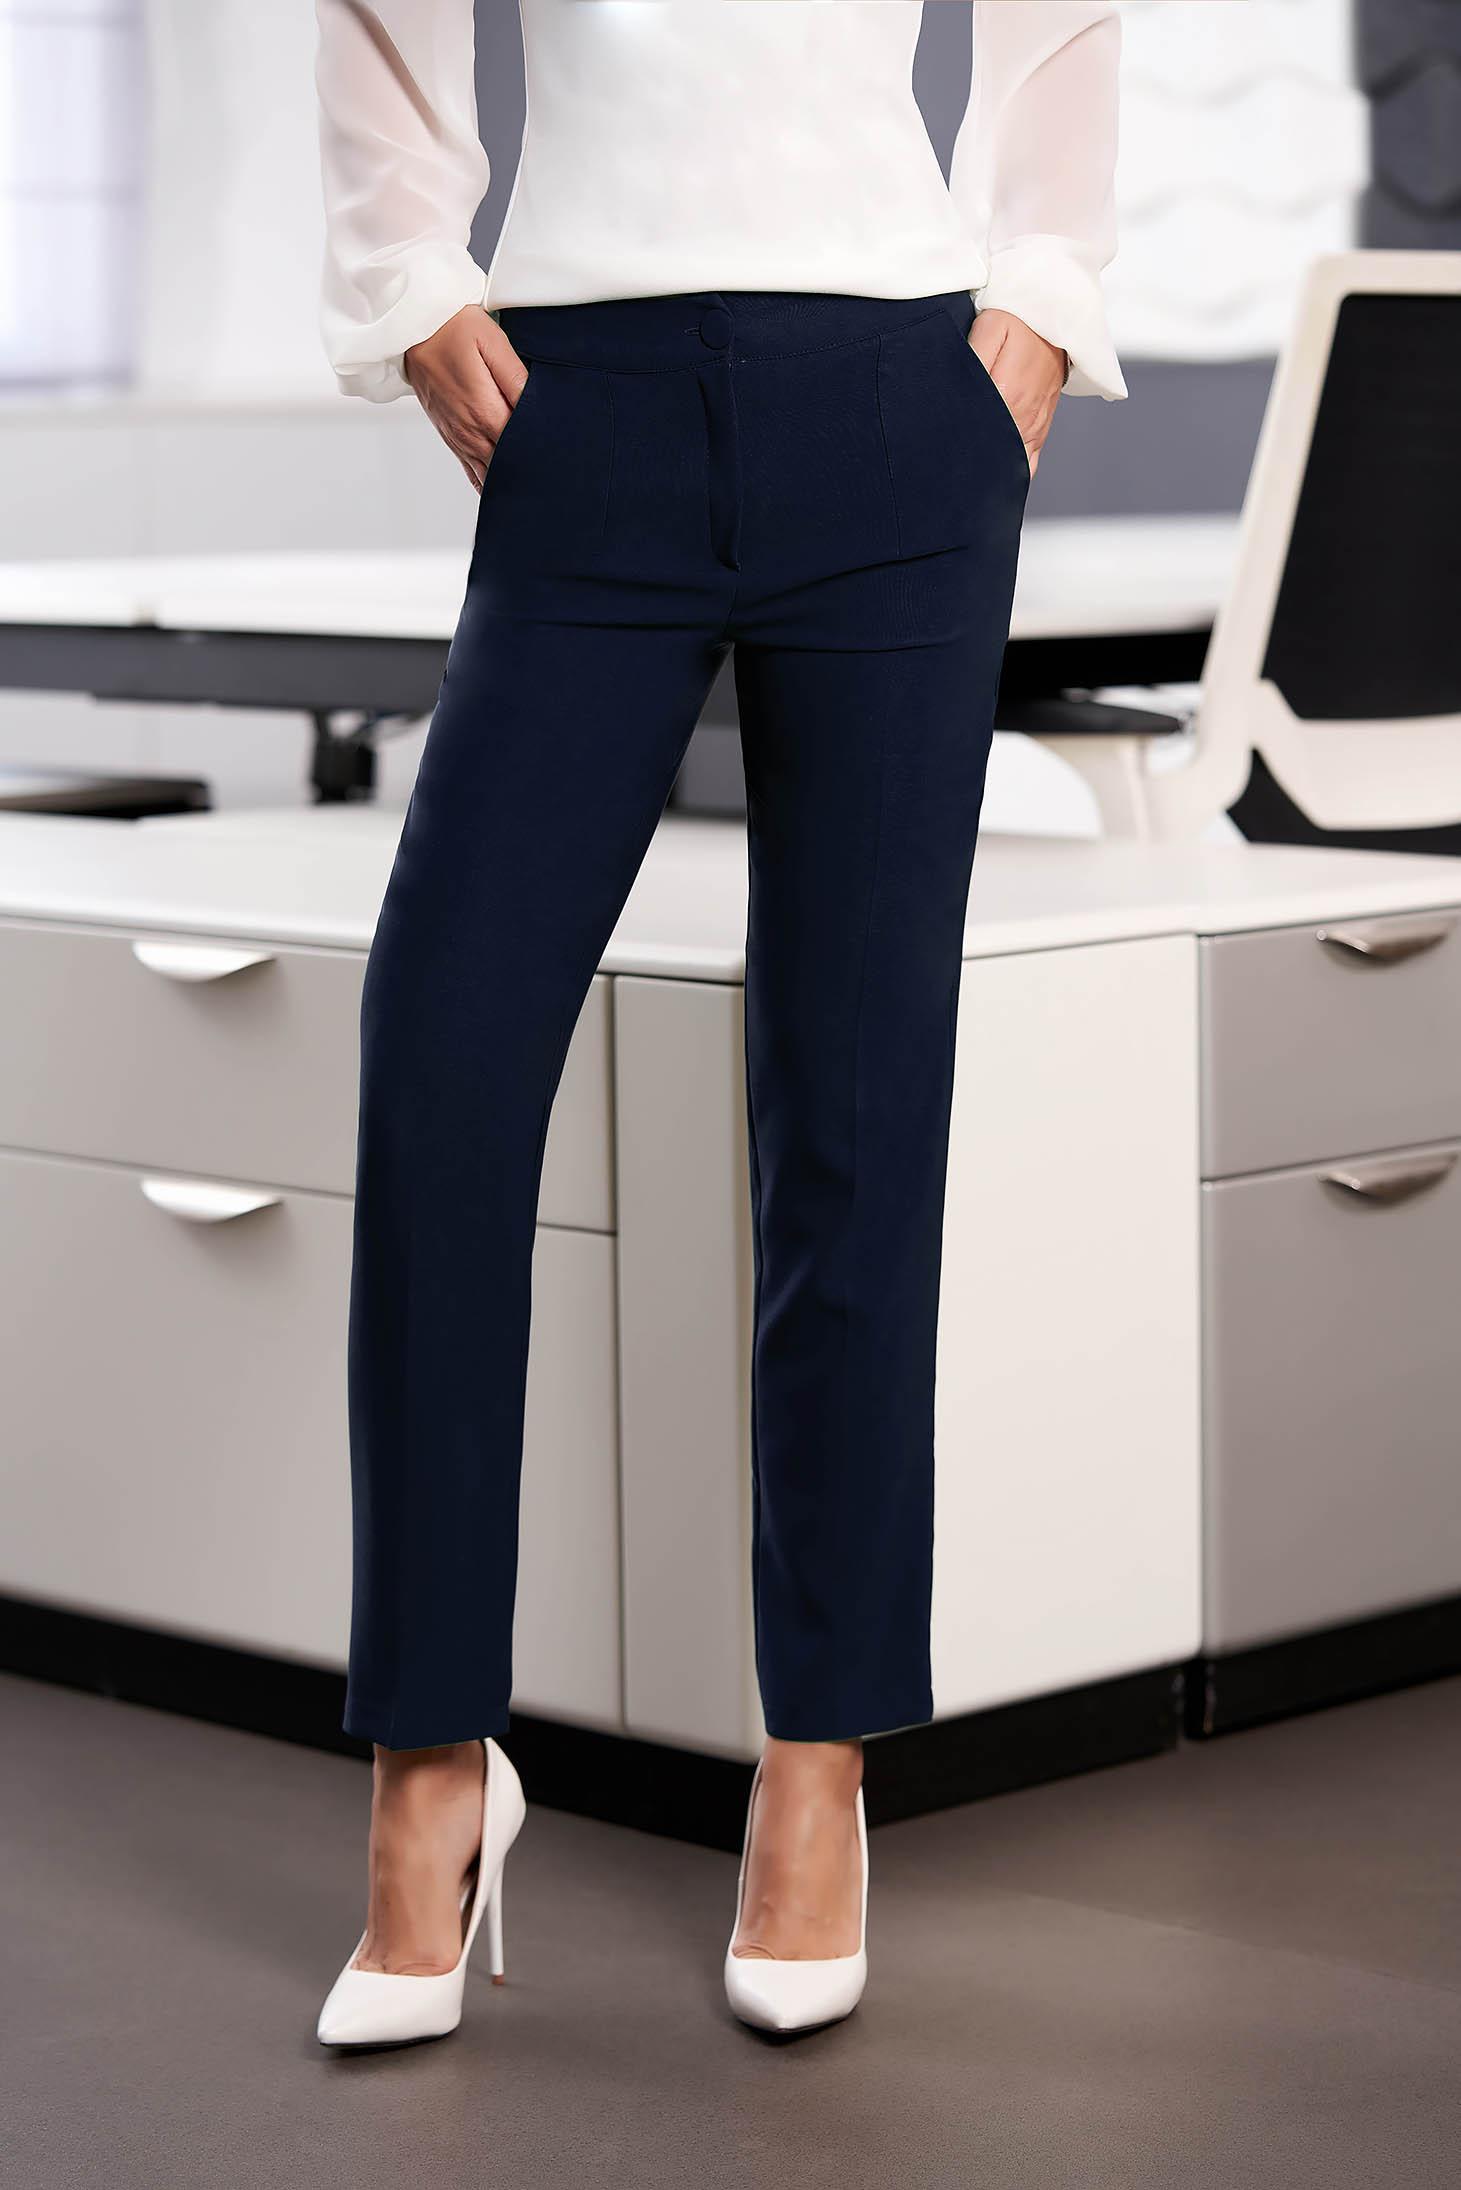 Pantaloni StarShinerS albastru-inchis office cu un croi drept din stofa usor elastica cu talie medie si buzunare